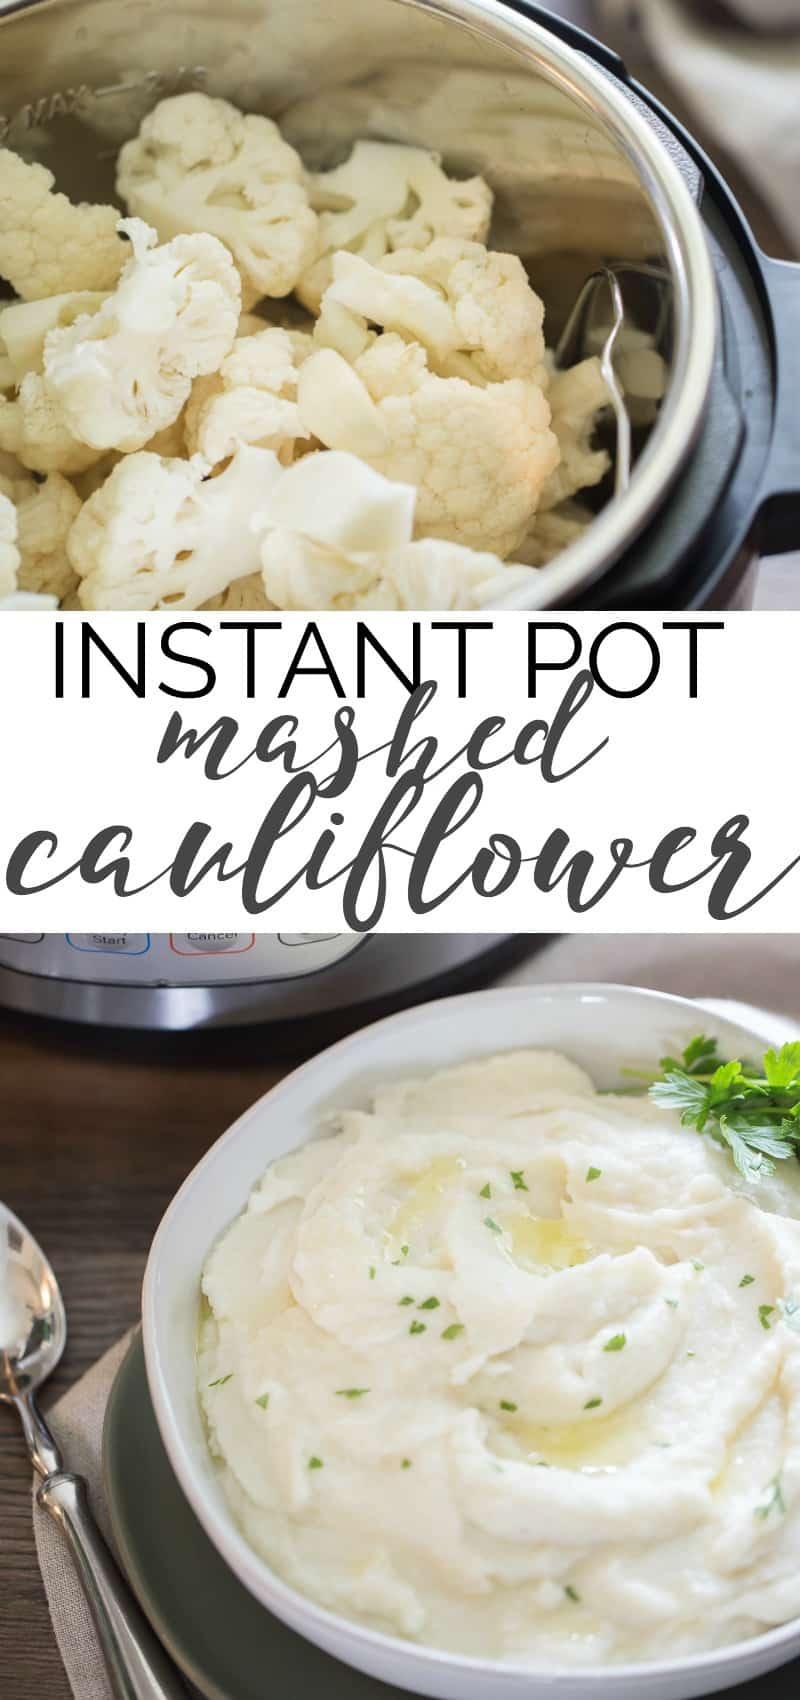 instant pot mashed cauliflower recipe pin